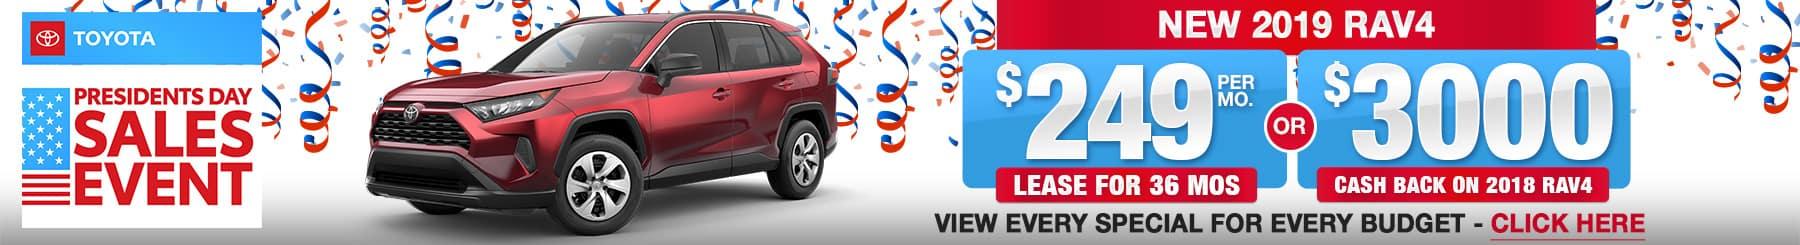 Toyota RAV4 Lease Finance Specials